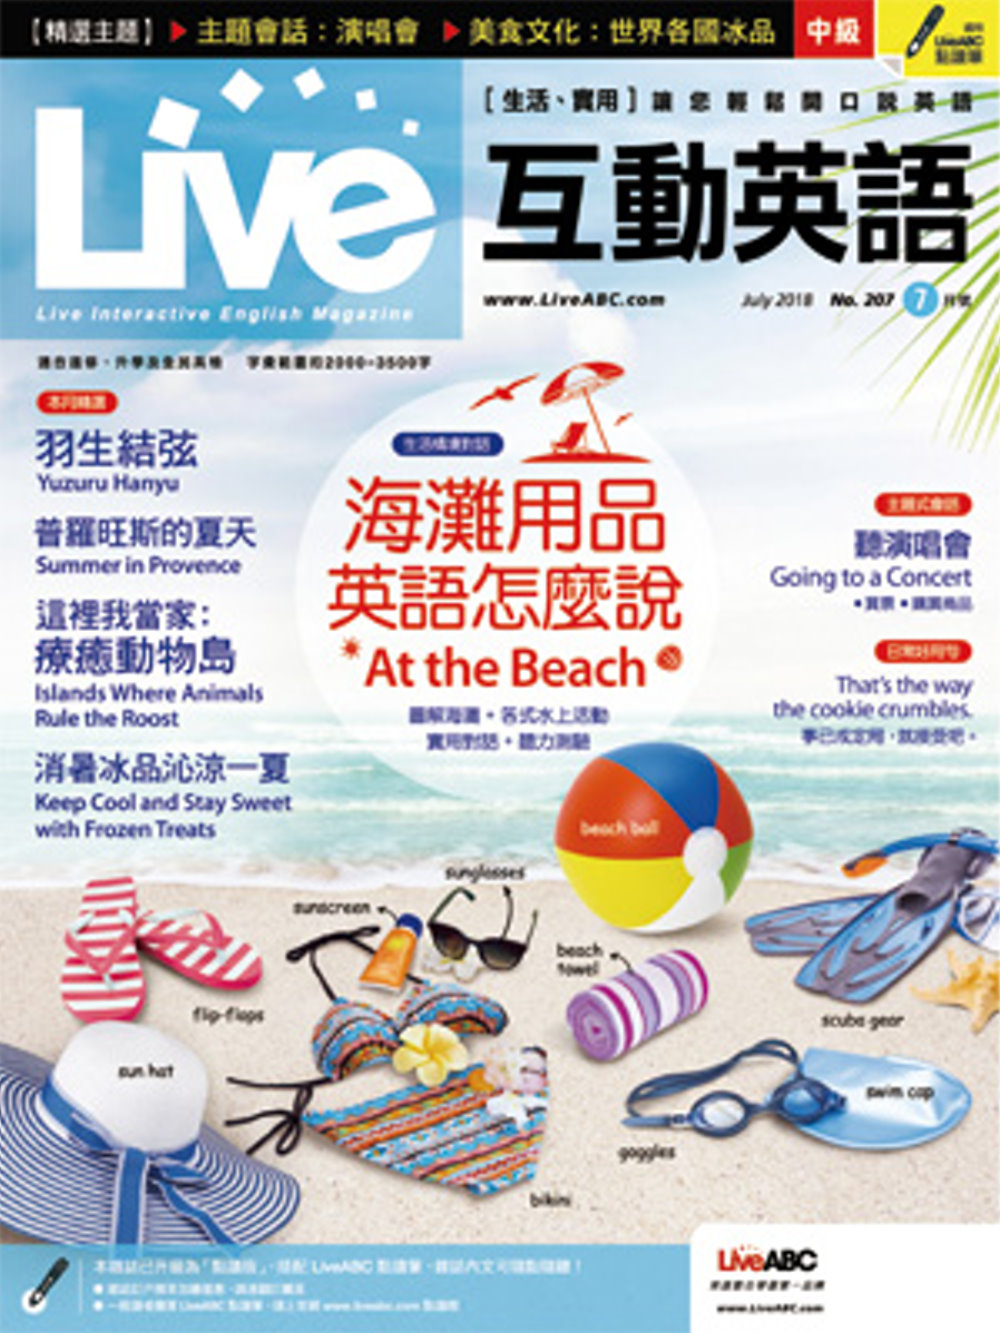 Live互動英語(互動光碟版) 7月號/2018 第207期